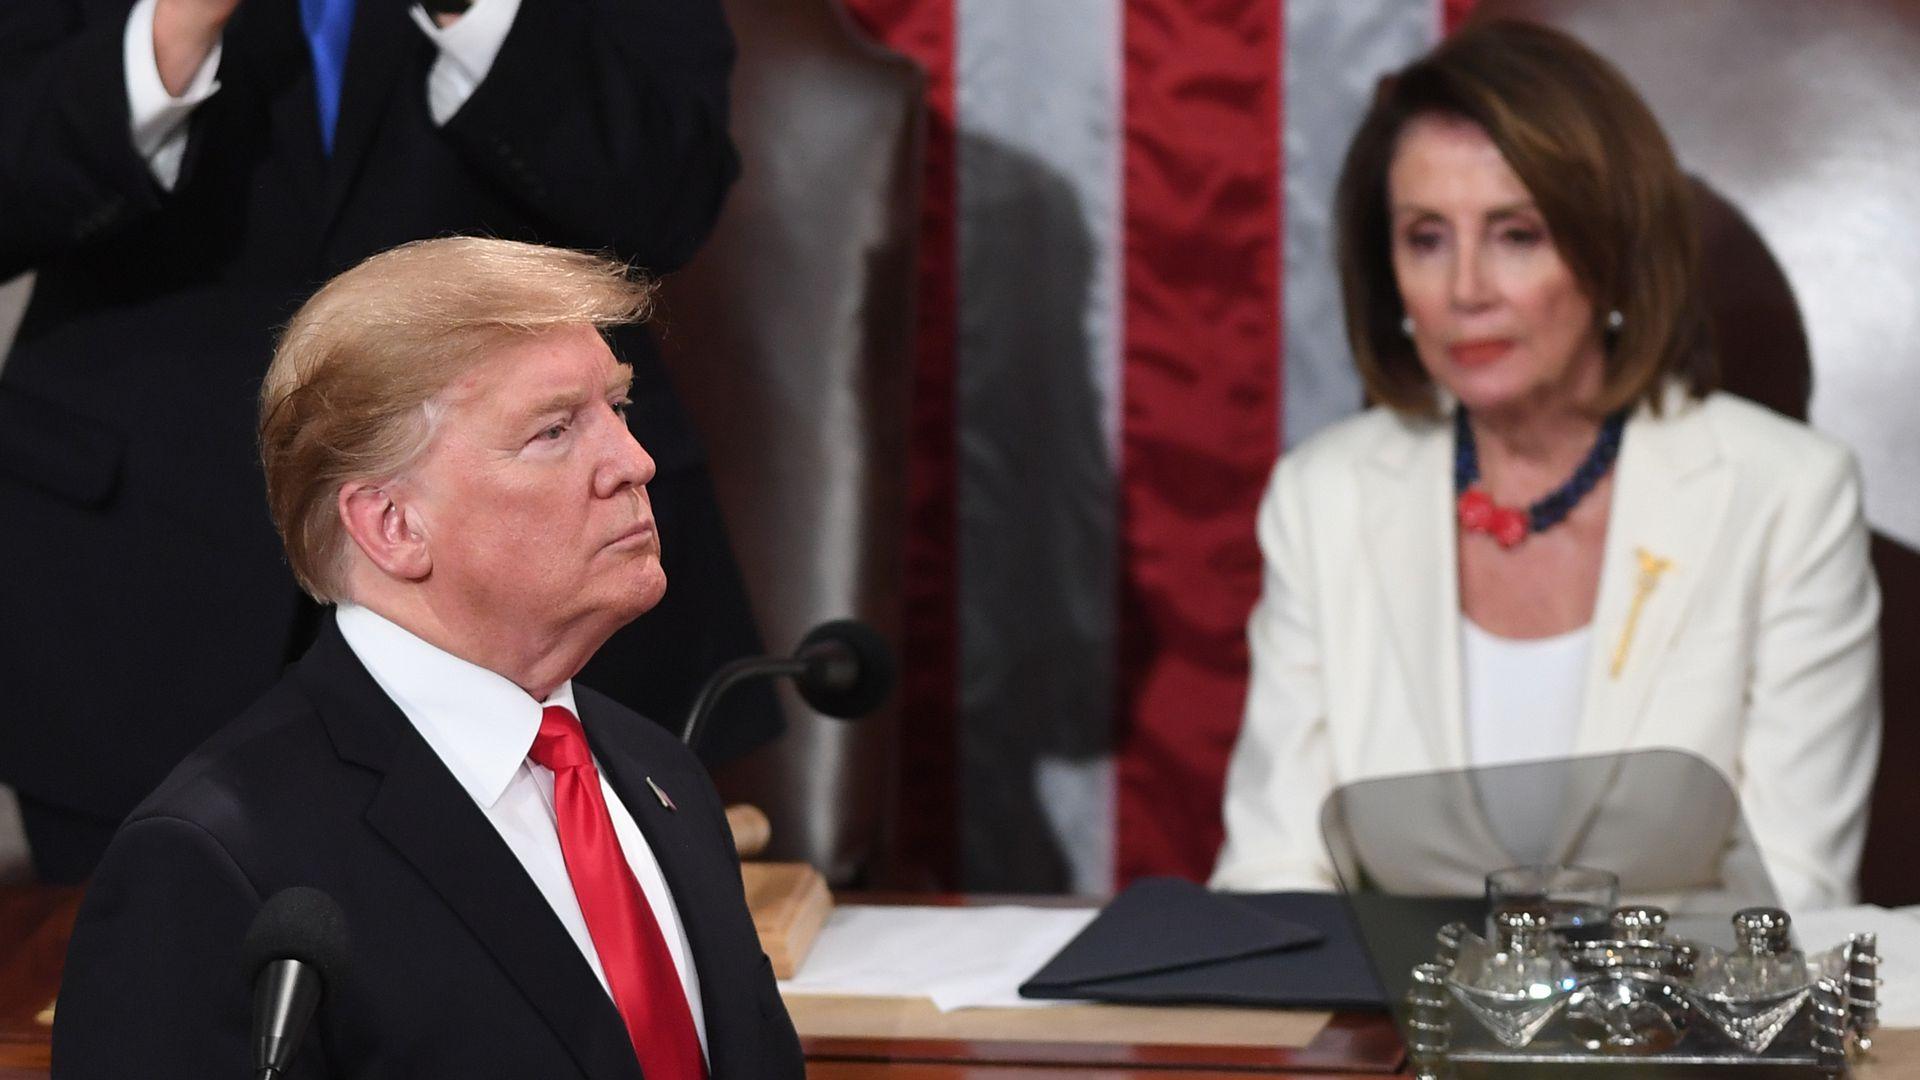 'Trump undermining US leadership role,' Democrats attack Trump for his Mexico deal